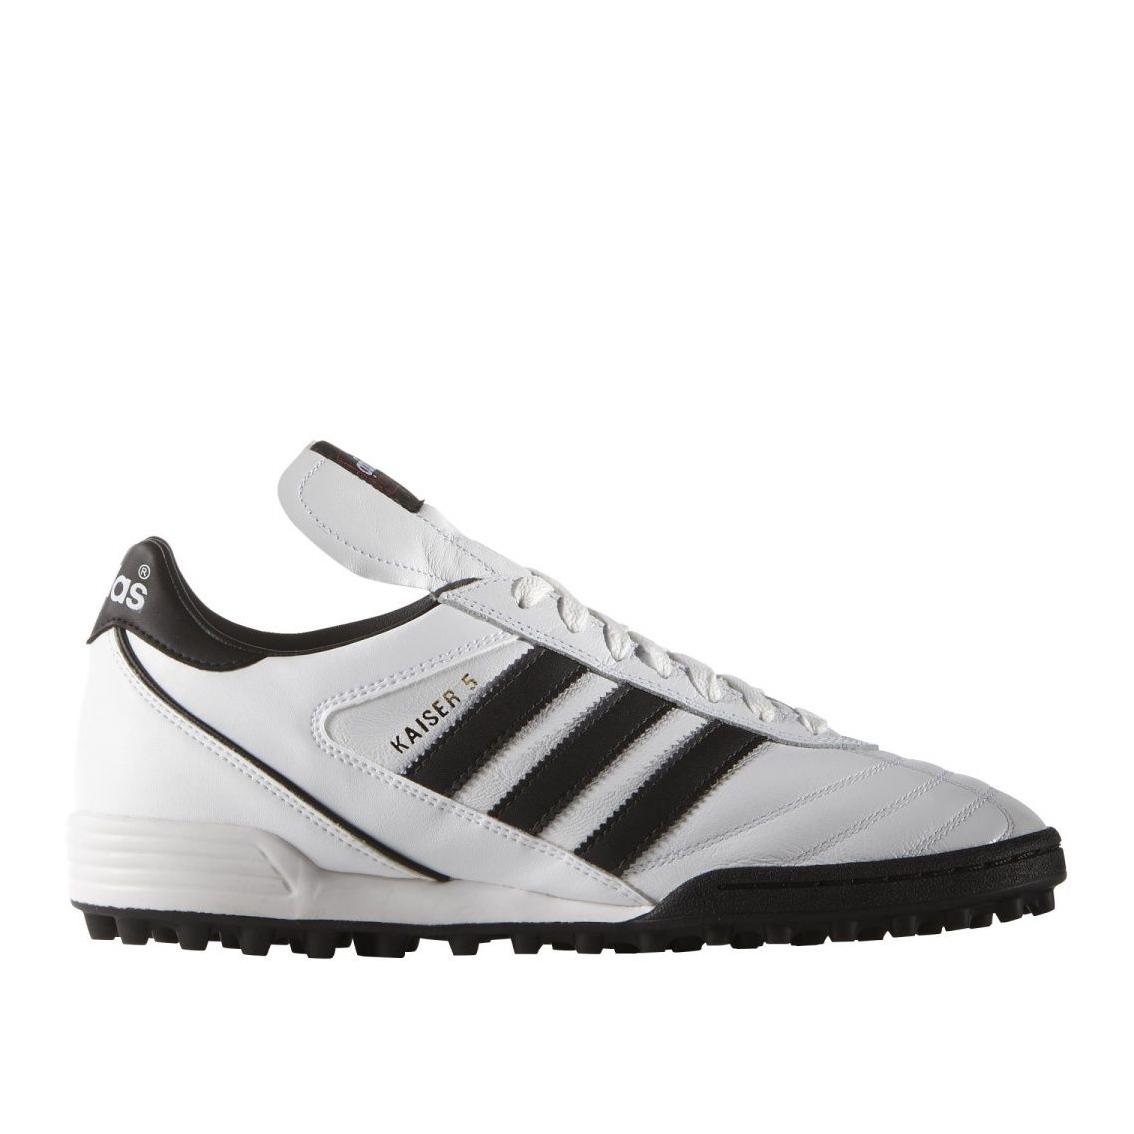 on sale 69b60 8df1f Soccer shoes adidas Kaiser 5 Team M B34260